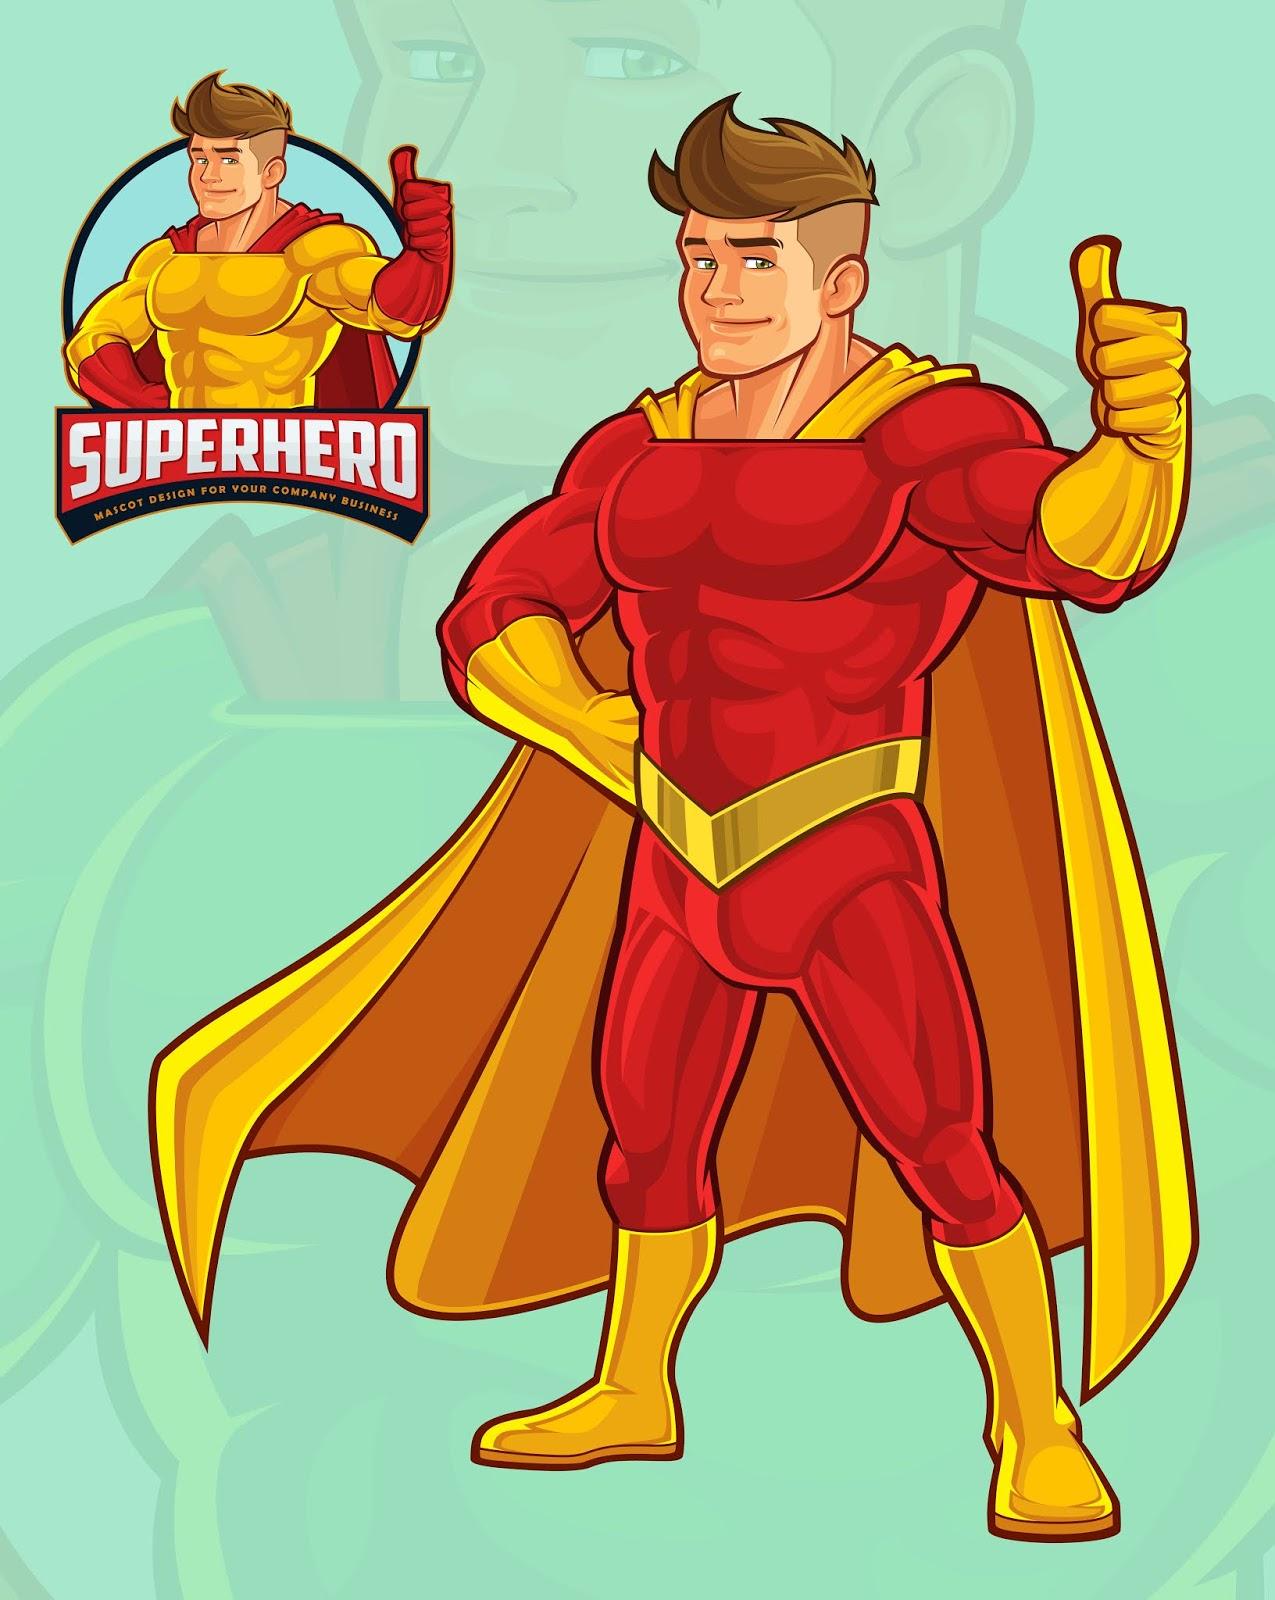 Superhero Mascot Free Download Vector CDR, AI, EPS and PNG Formats